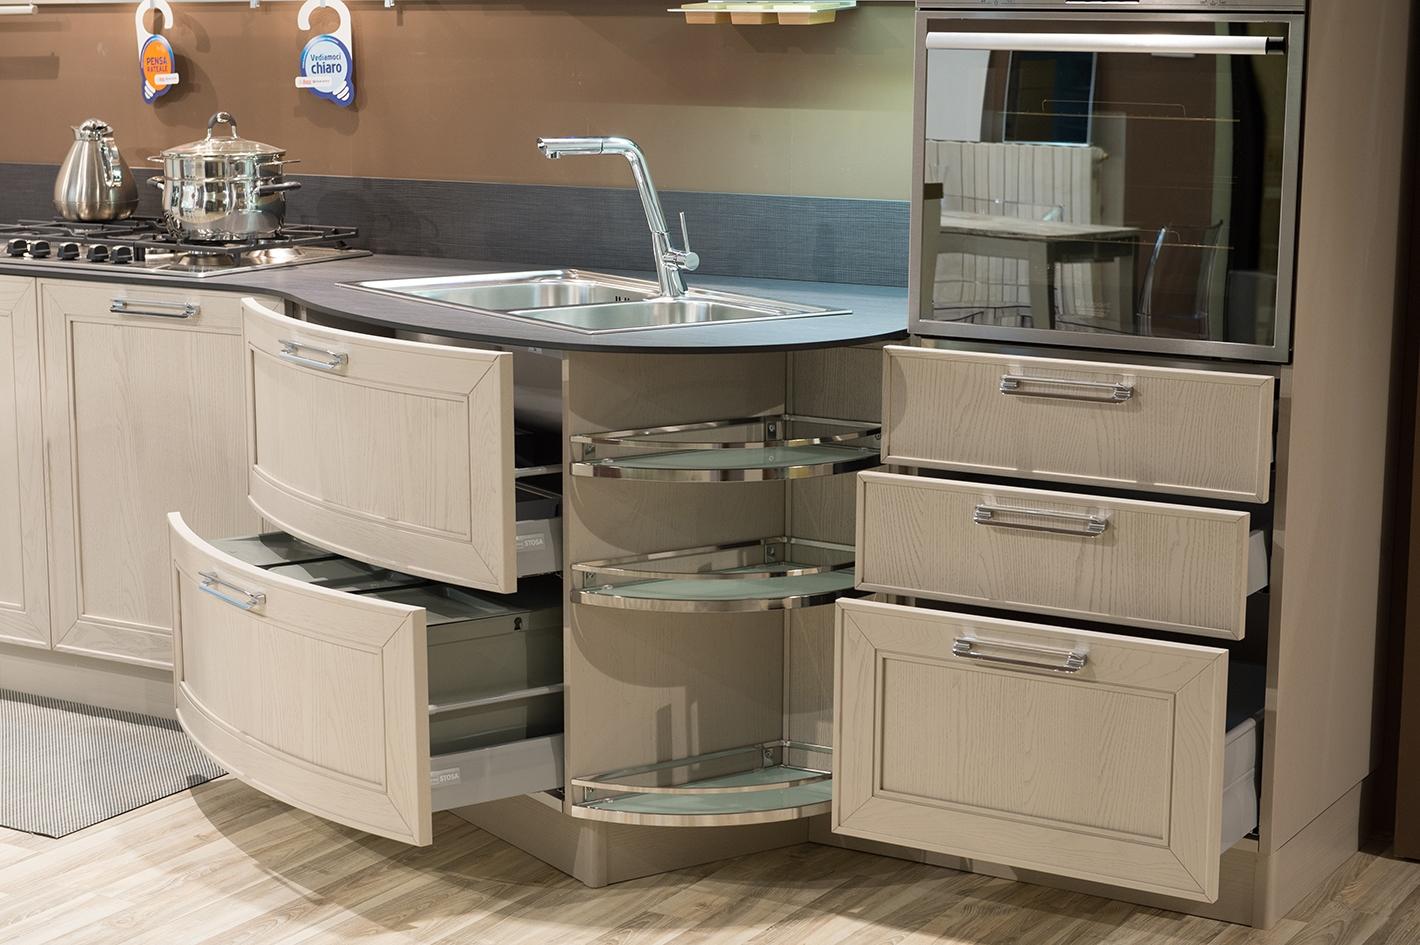 Cucina stosa maxim in offerta 22238 cucine a prezzi scontati for Stosa cucine prezzi